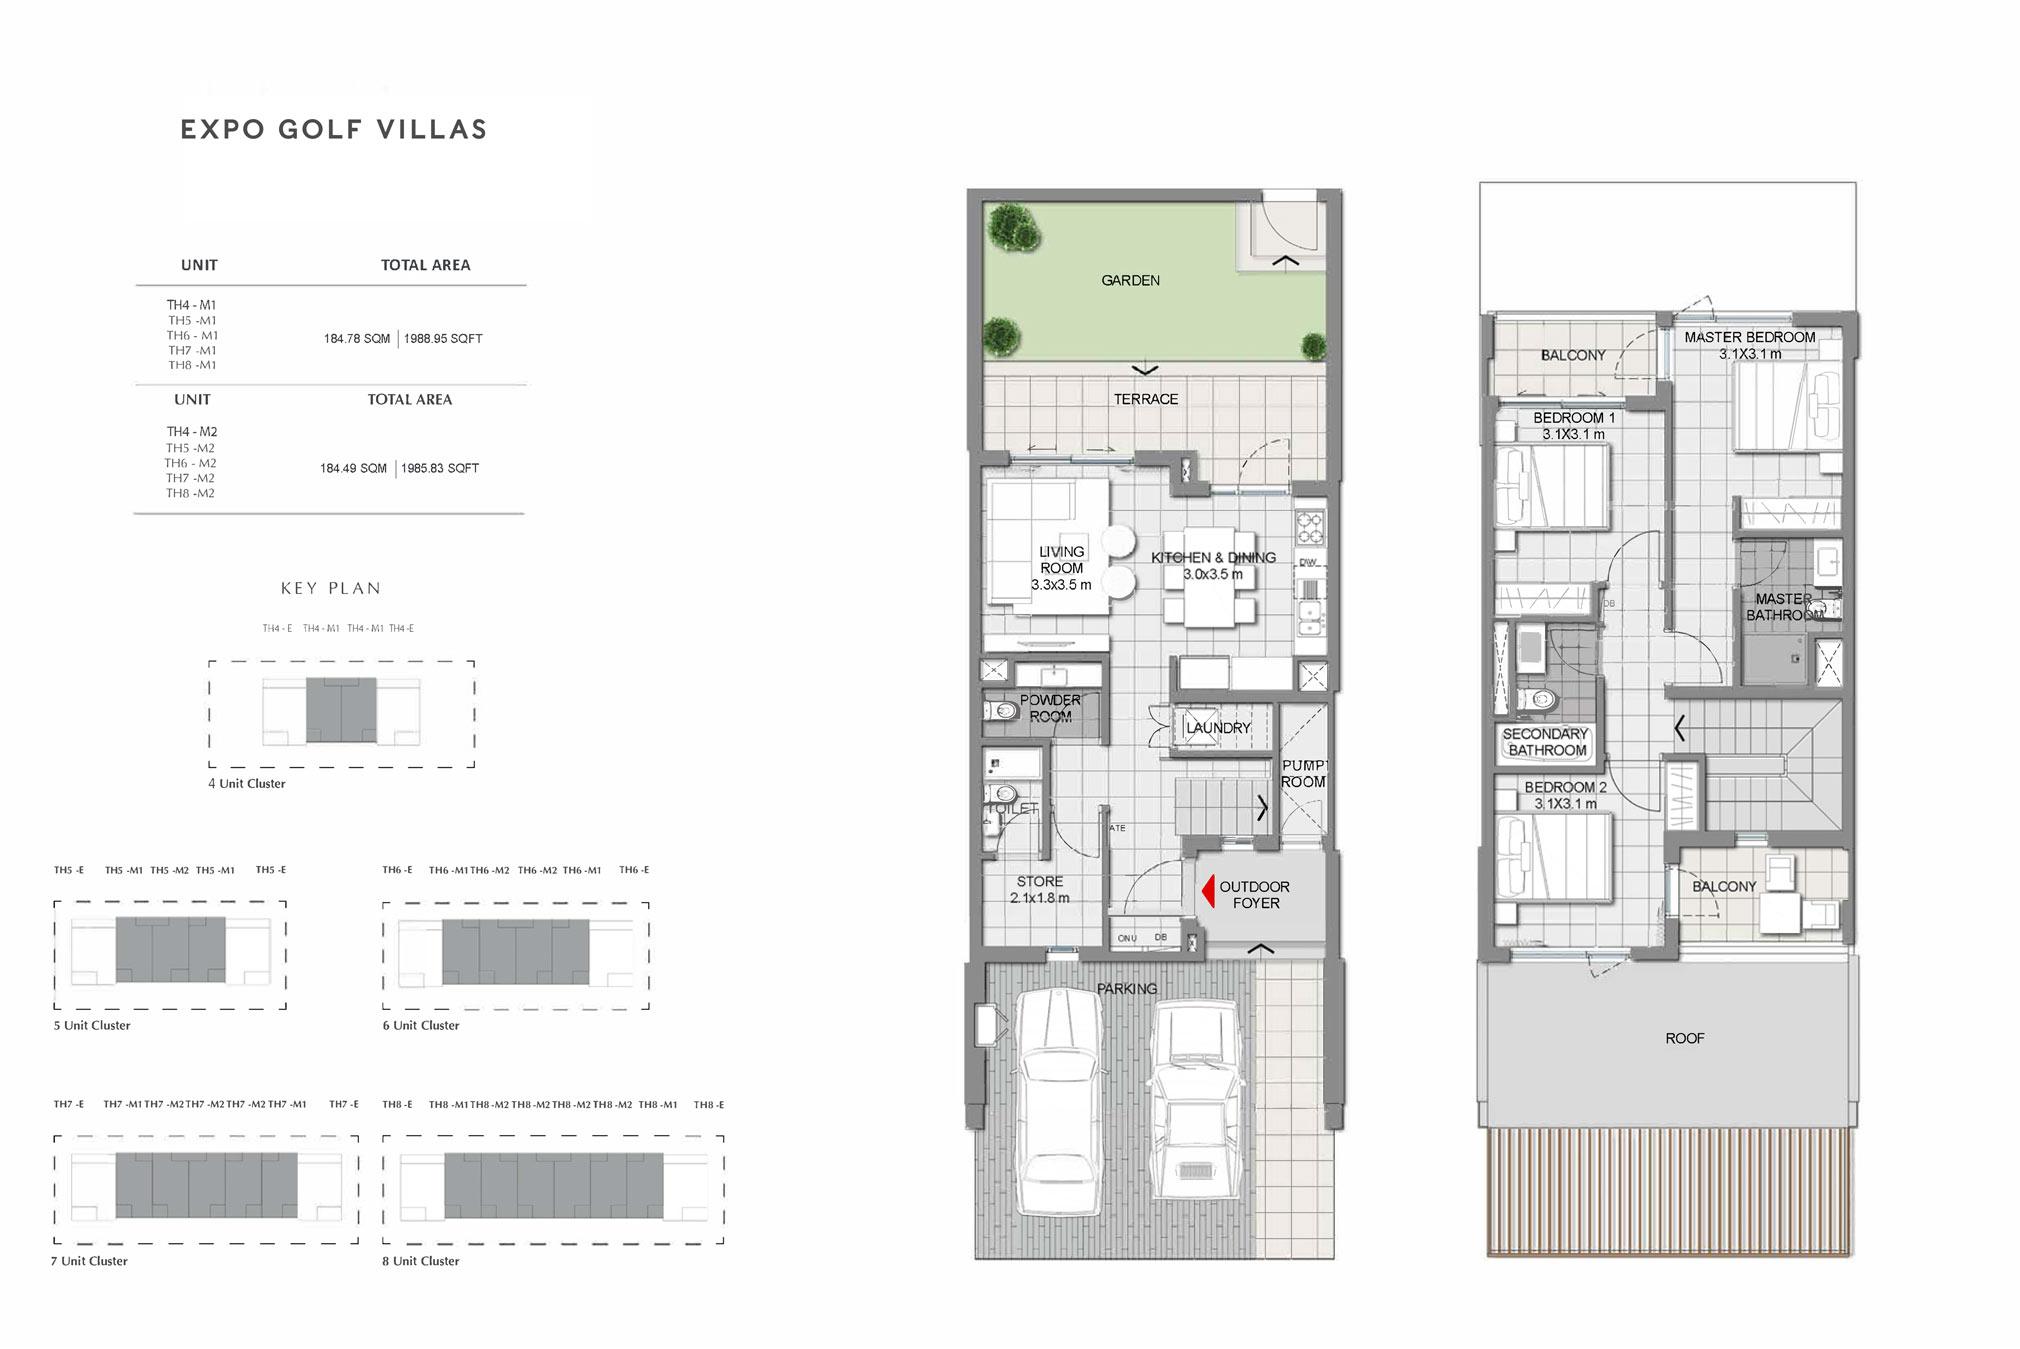 3 Bedroom Villas Size 1985 to 1988 Sq Ft